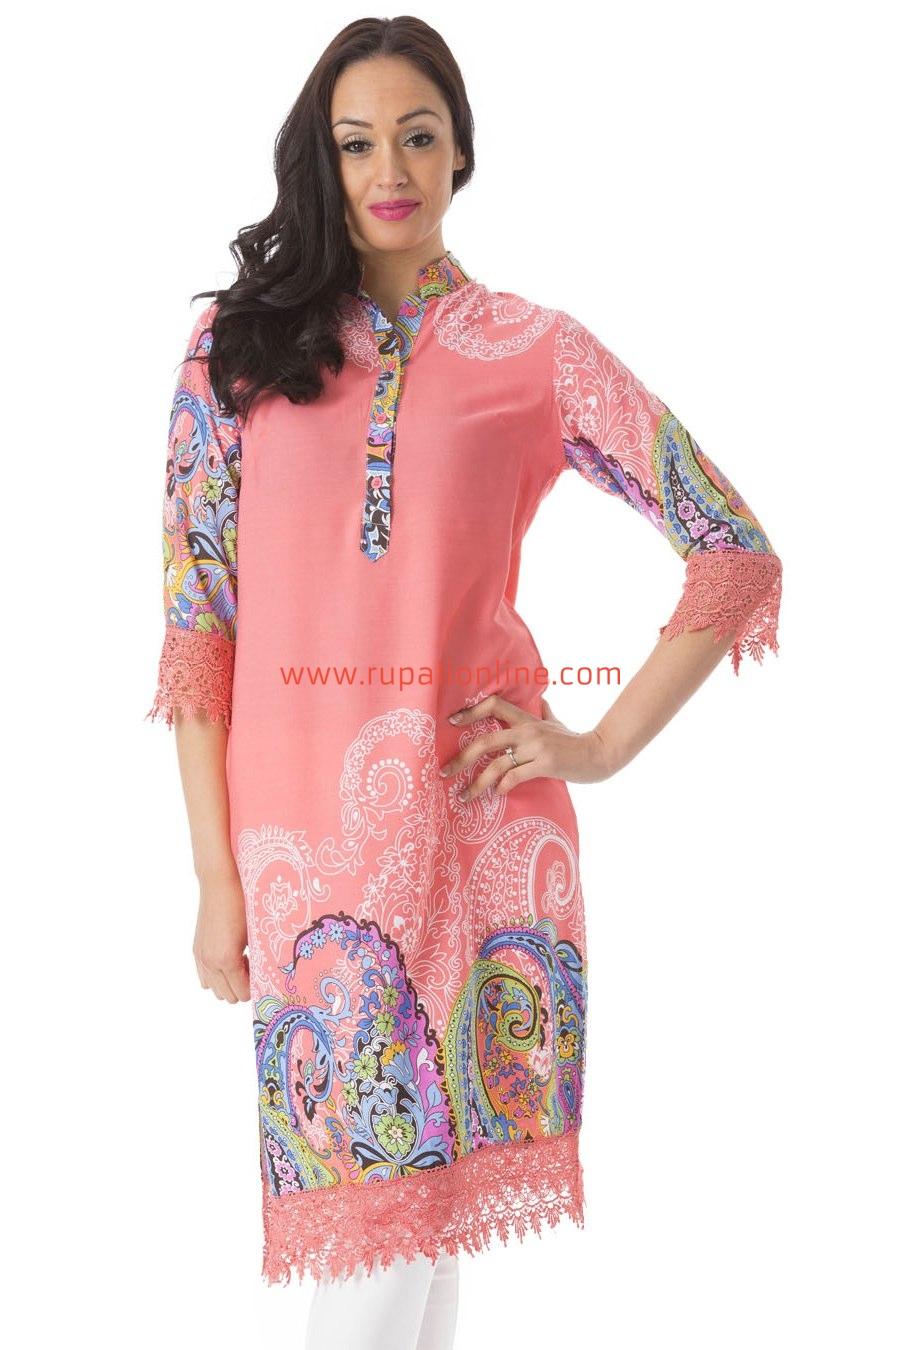 9f8eb2e892 Buy an excelent range of Asian Womens kaftans , Sarees, Salwar Kameez,  Churidar and Trouser Suits. Kaftans, Bridal Saree, Asian womens Clothes  from Rupali ...